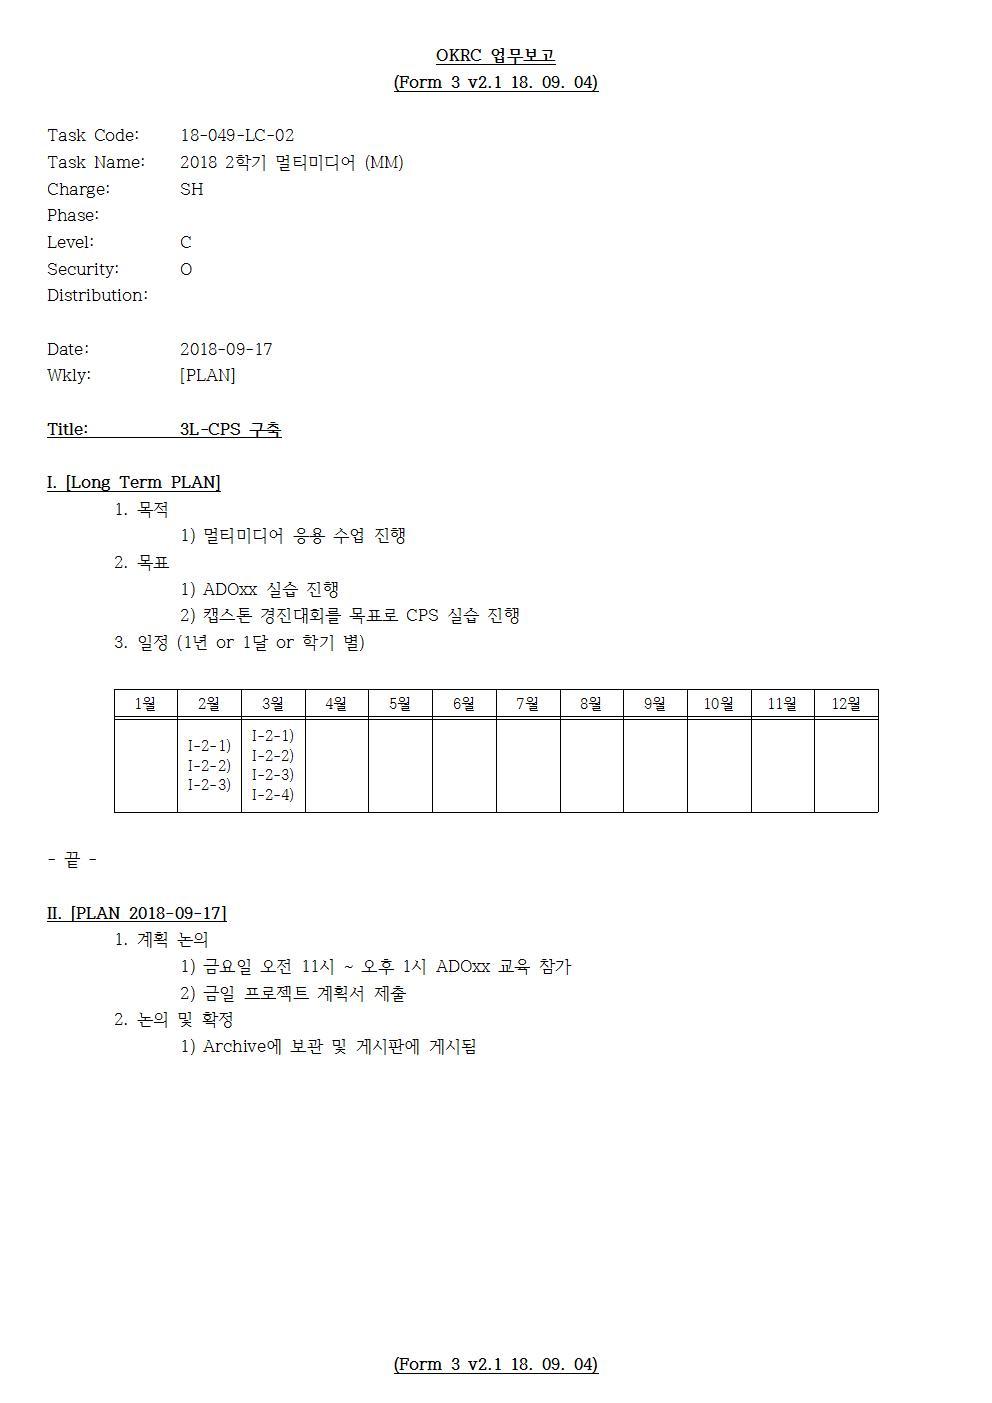 D-[18-049-LC-02]-[MM]-[2018-09-17][SH]001.jpg